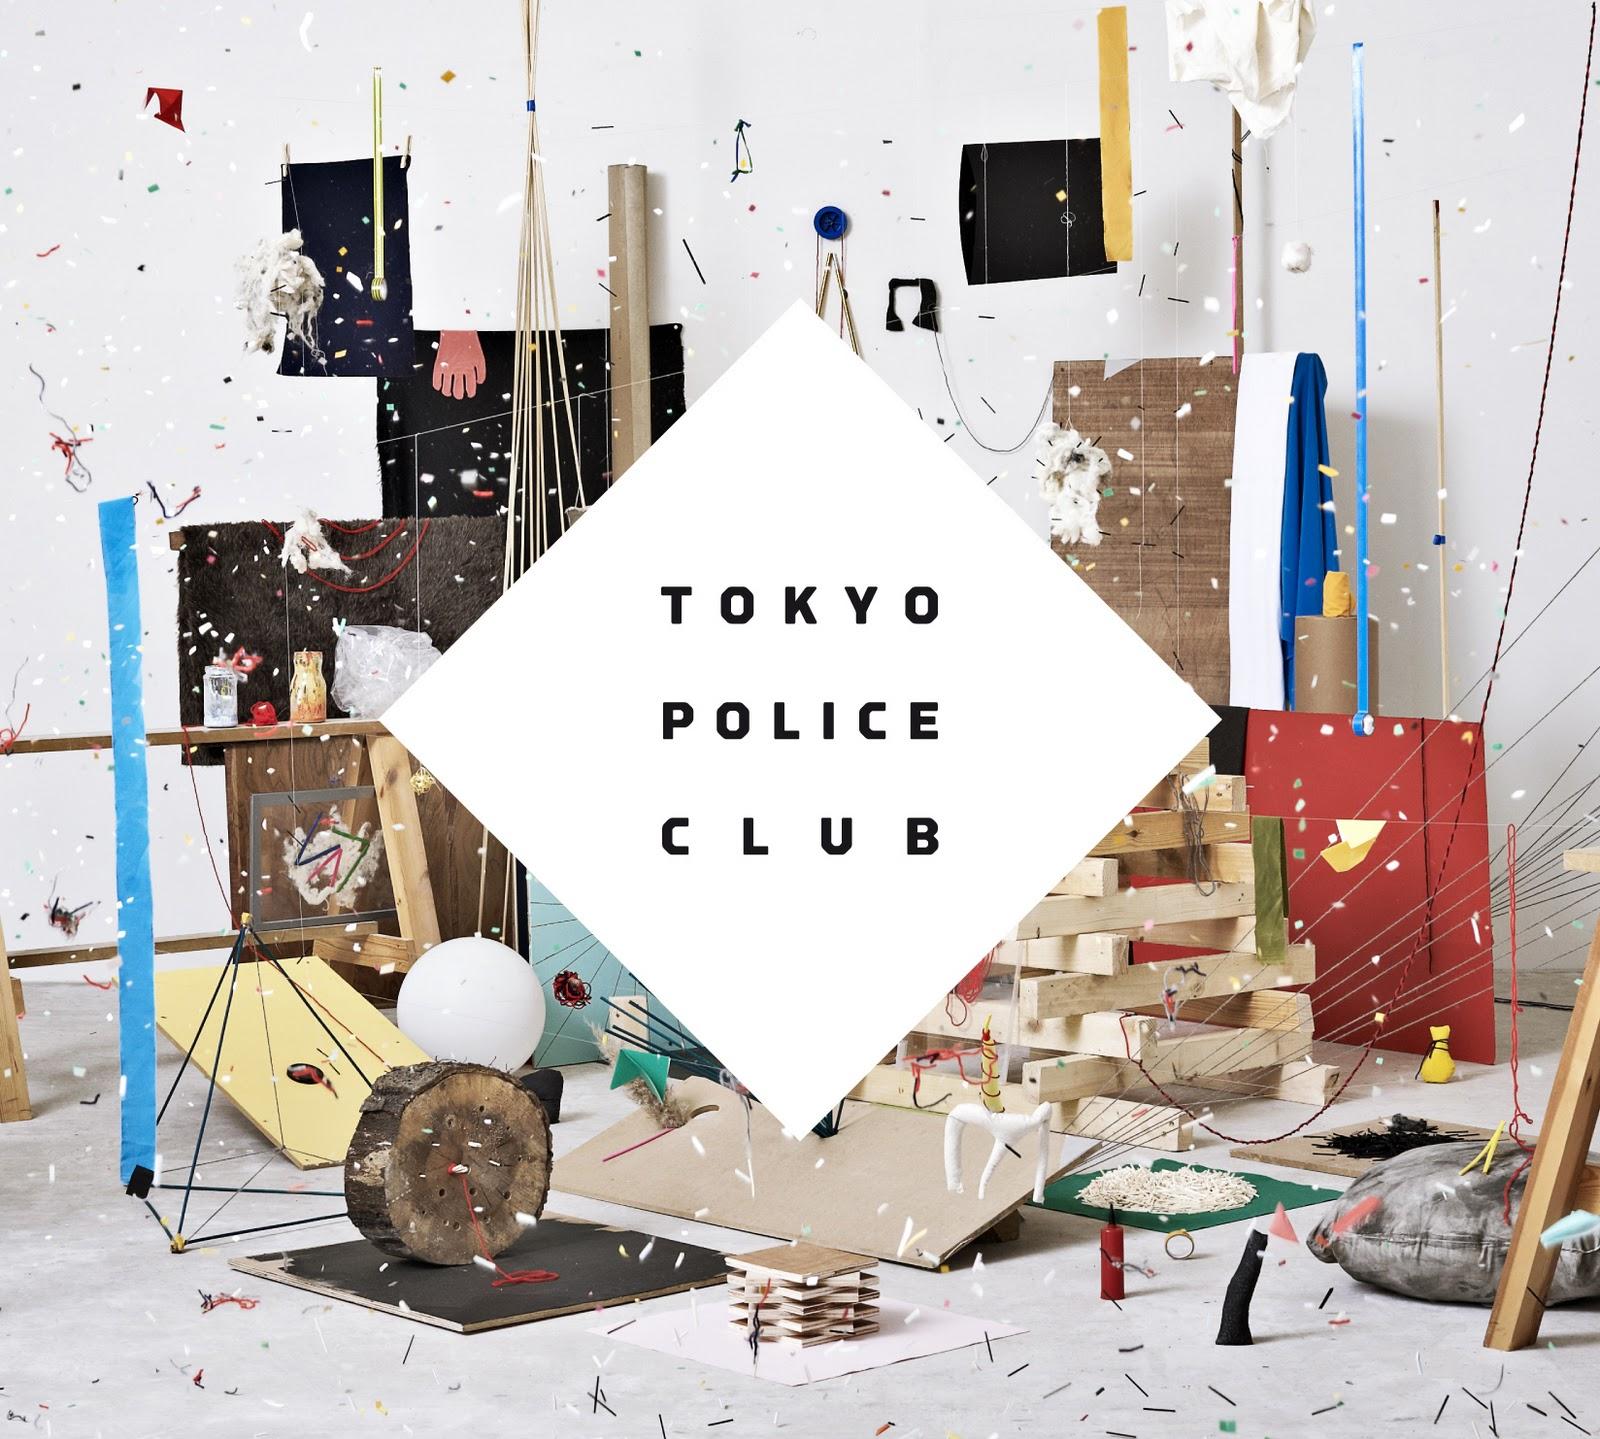 http://1.bp.blogspot.com/_YddqLQqwISc/TDdfgZCP5JI/AAAAAAAAAKw/M1fdljD8u2A/s1600/tokyo%25252Bpolice%25252Bclub_champ.jpg